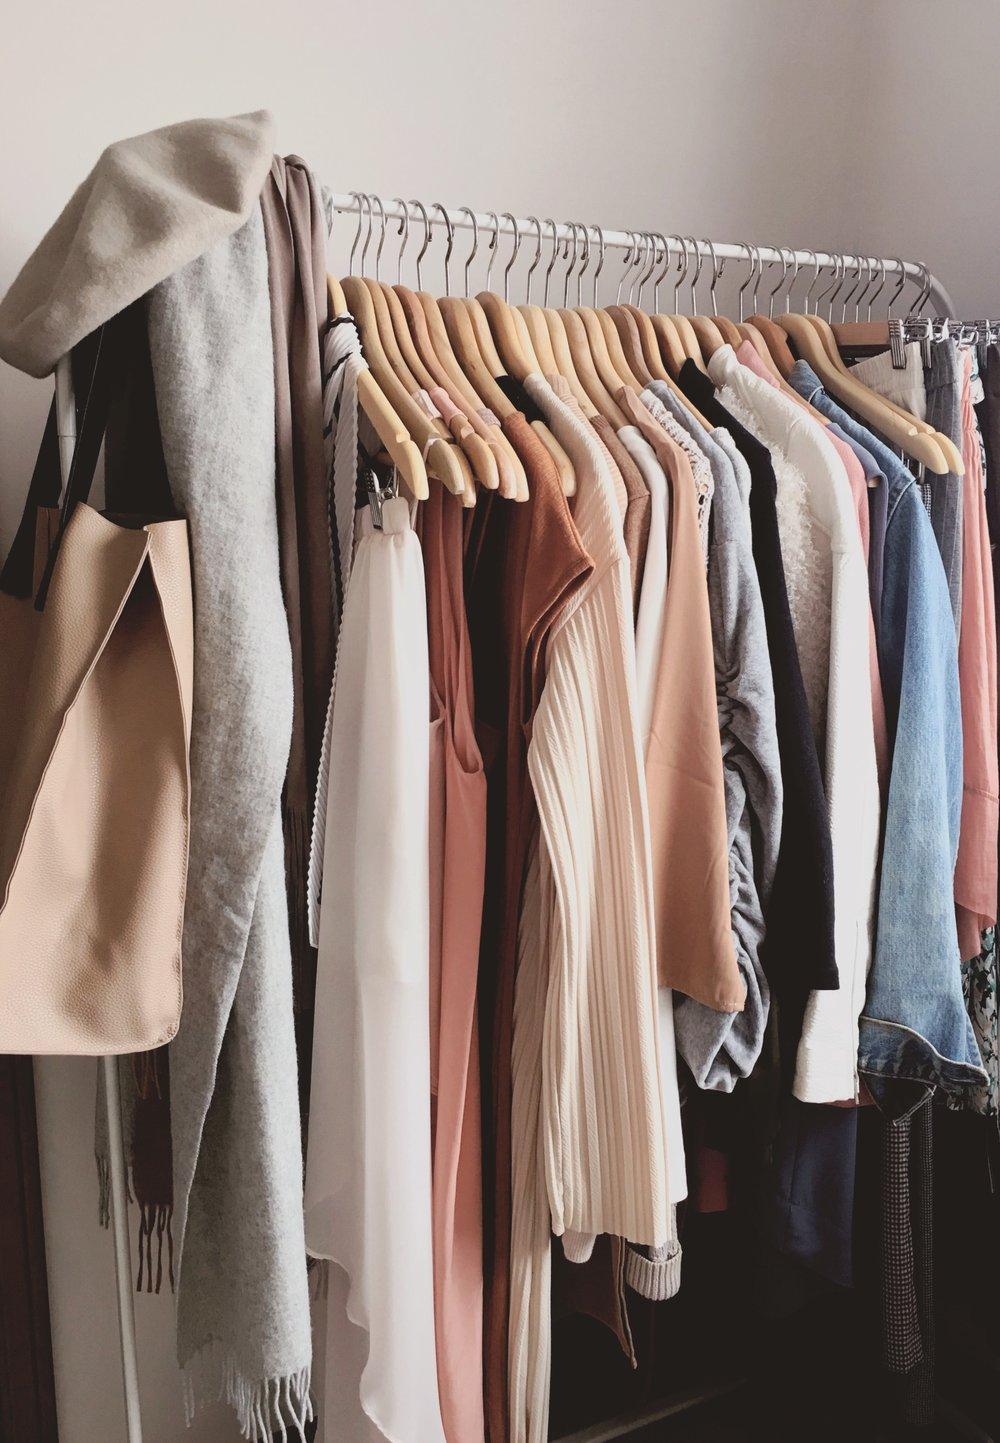 A Modest Closet  - My attempt at simplicity